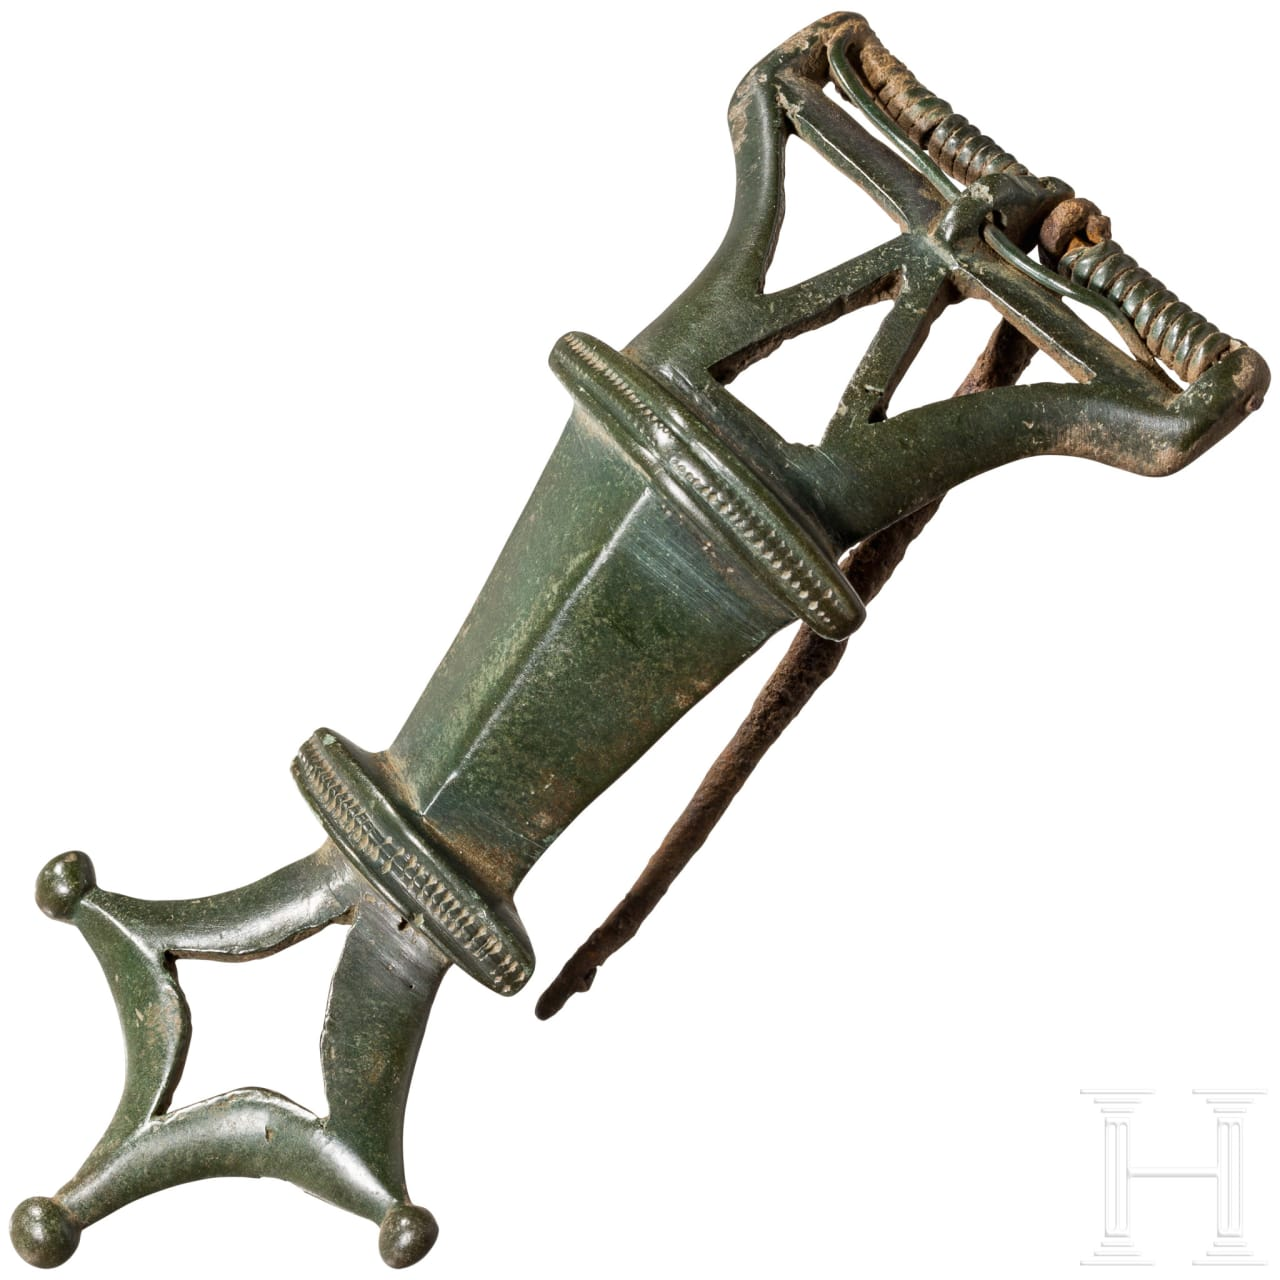 Große Bronzefibel, Kiever Kultur, 4. Jhdt.